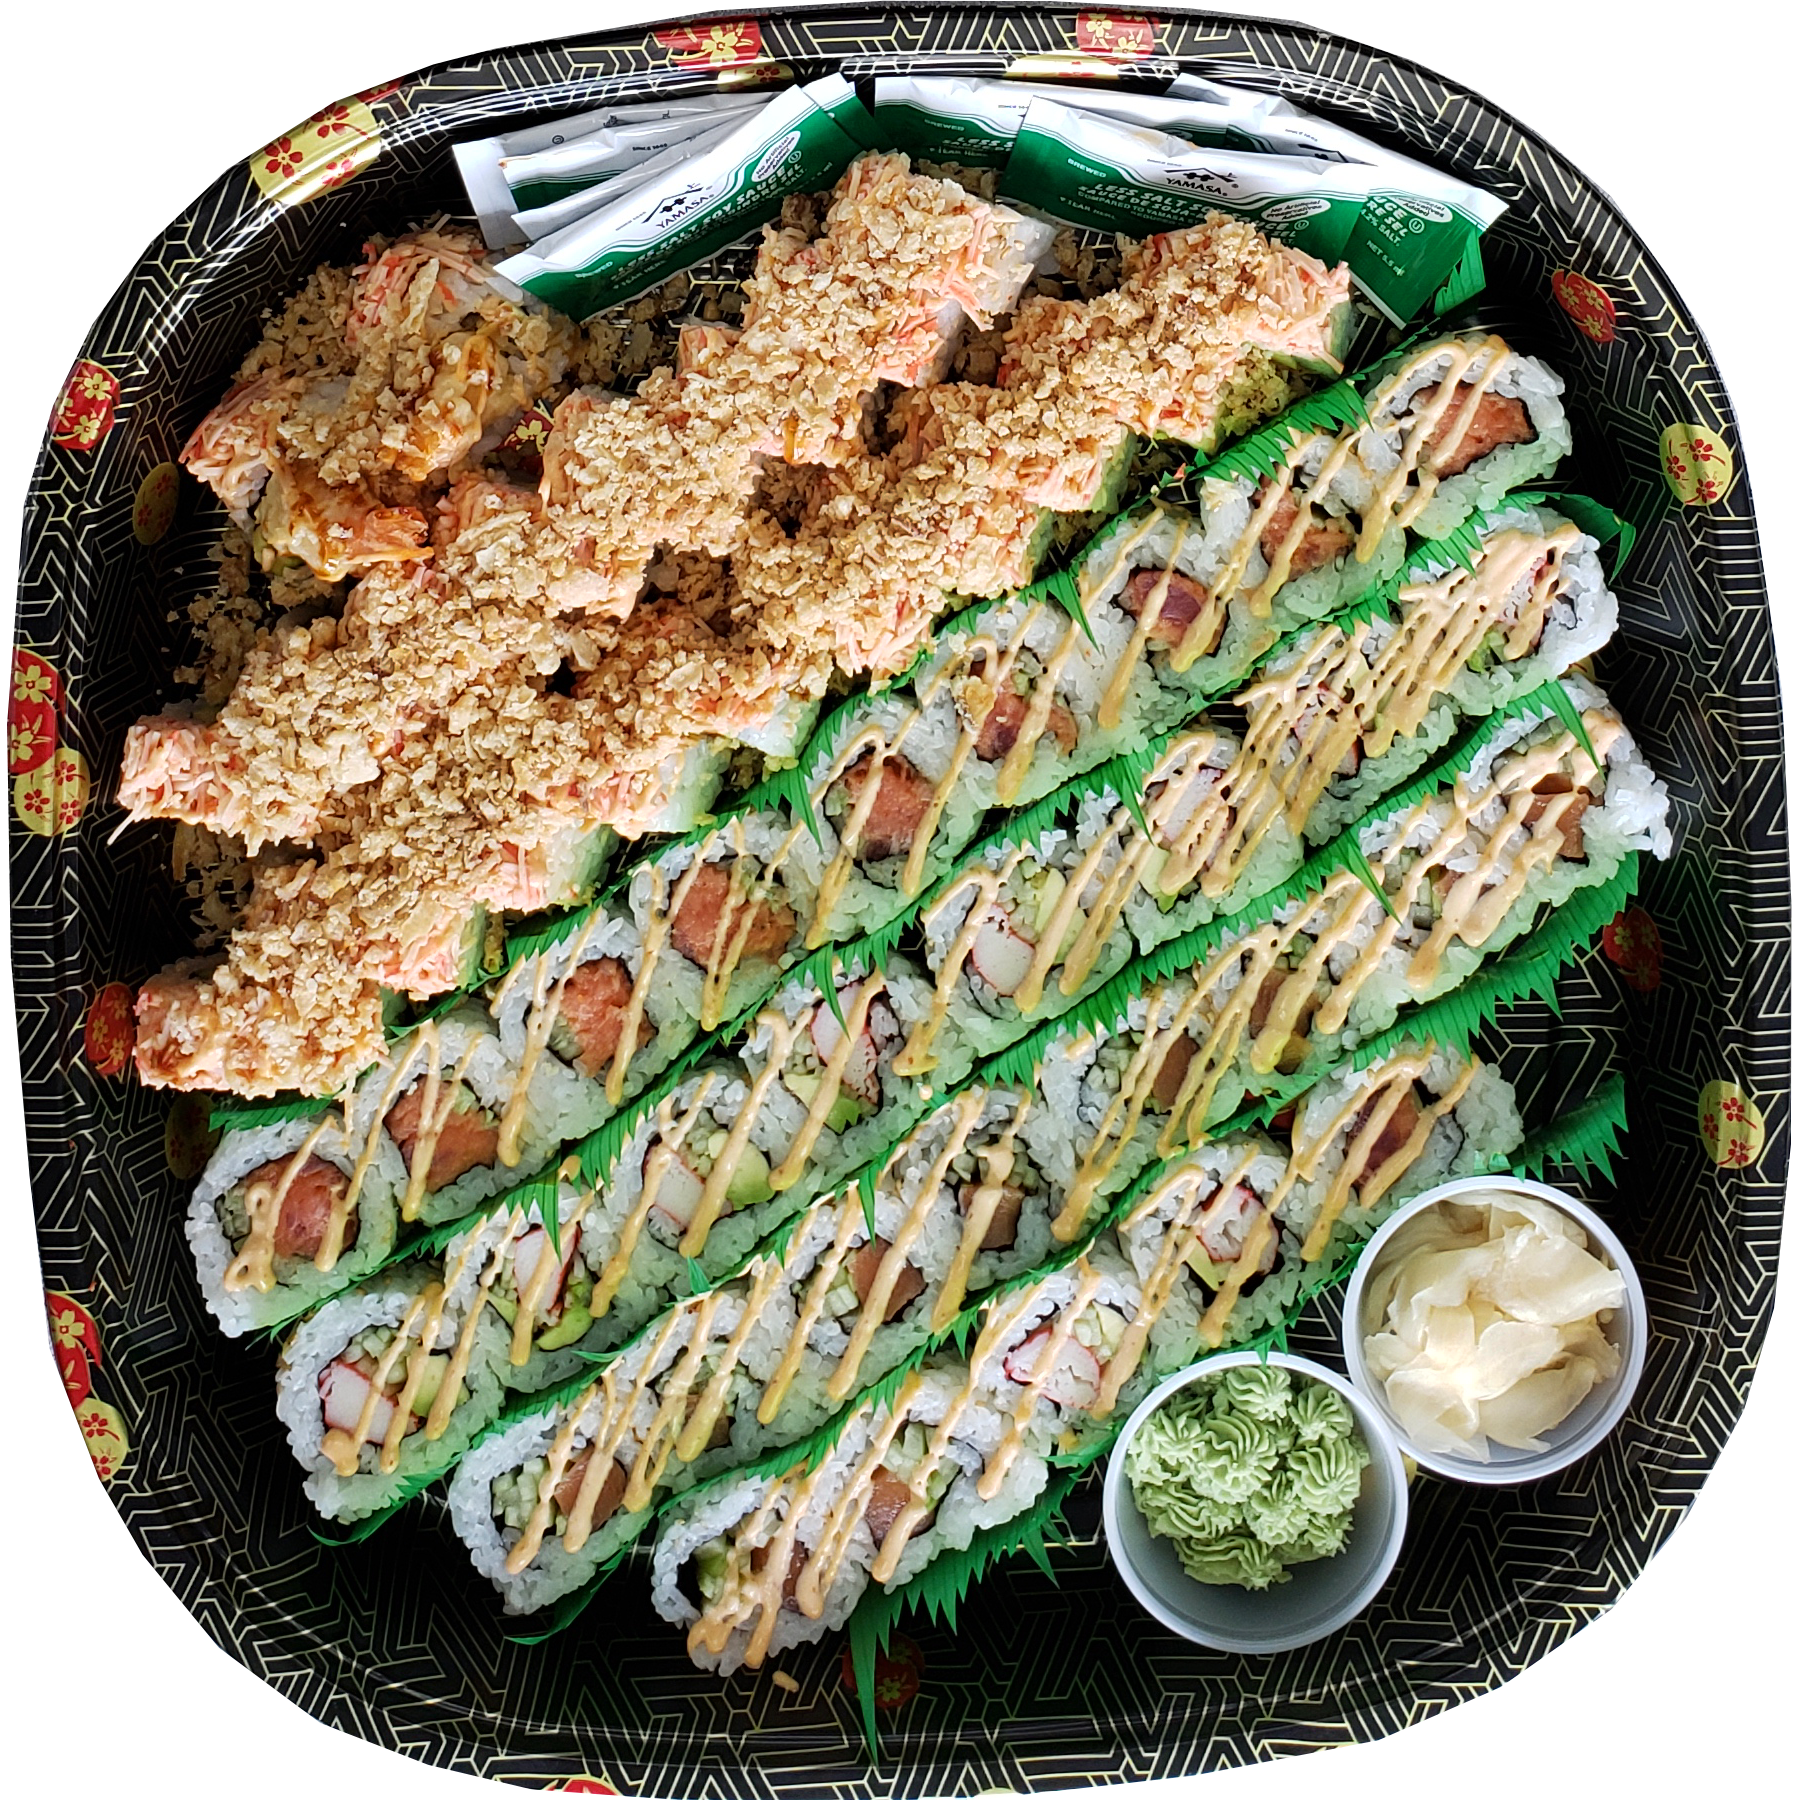 sushi 3.png